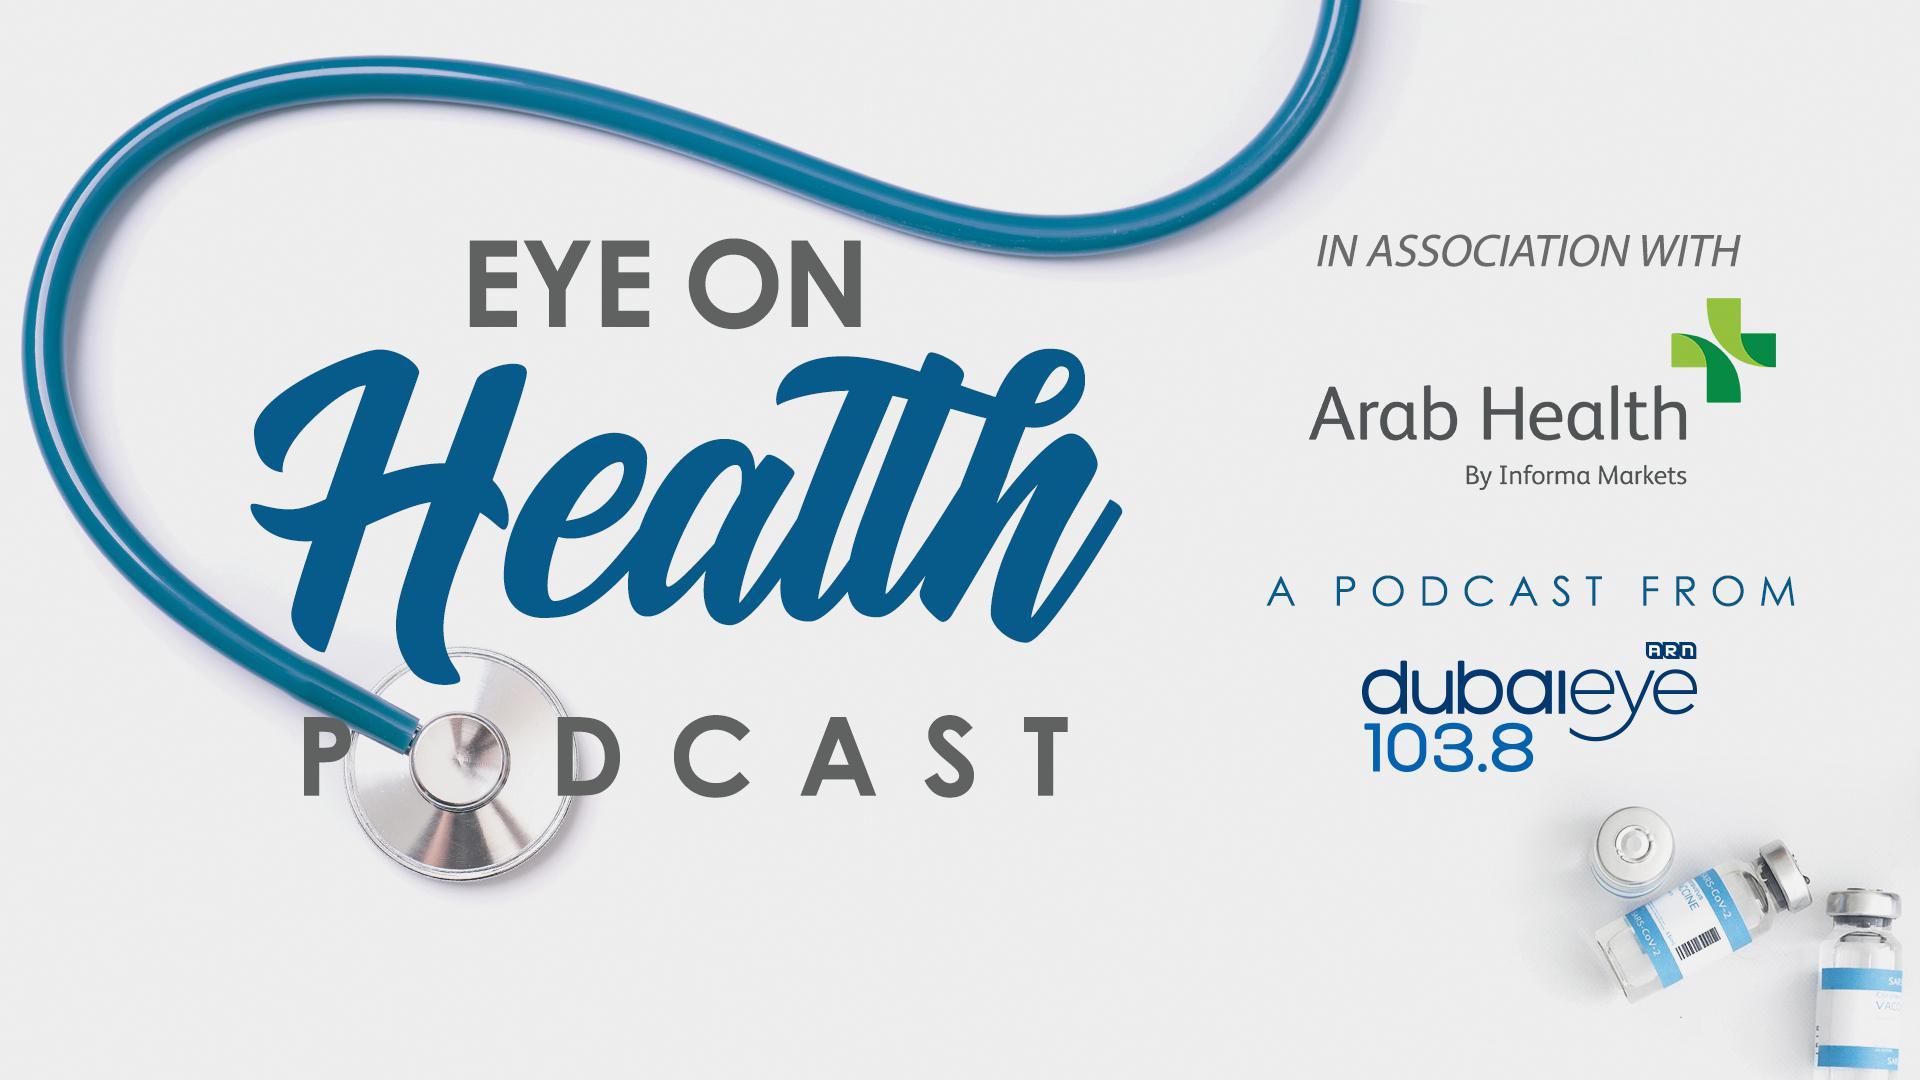 Eye on Health